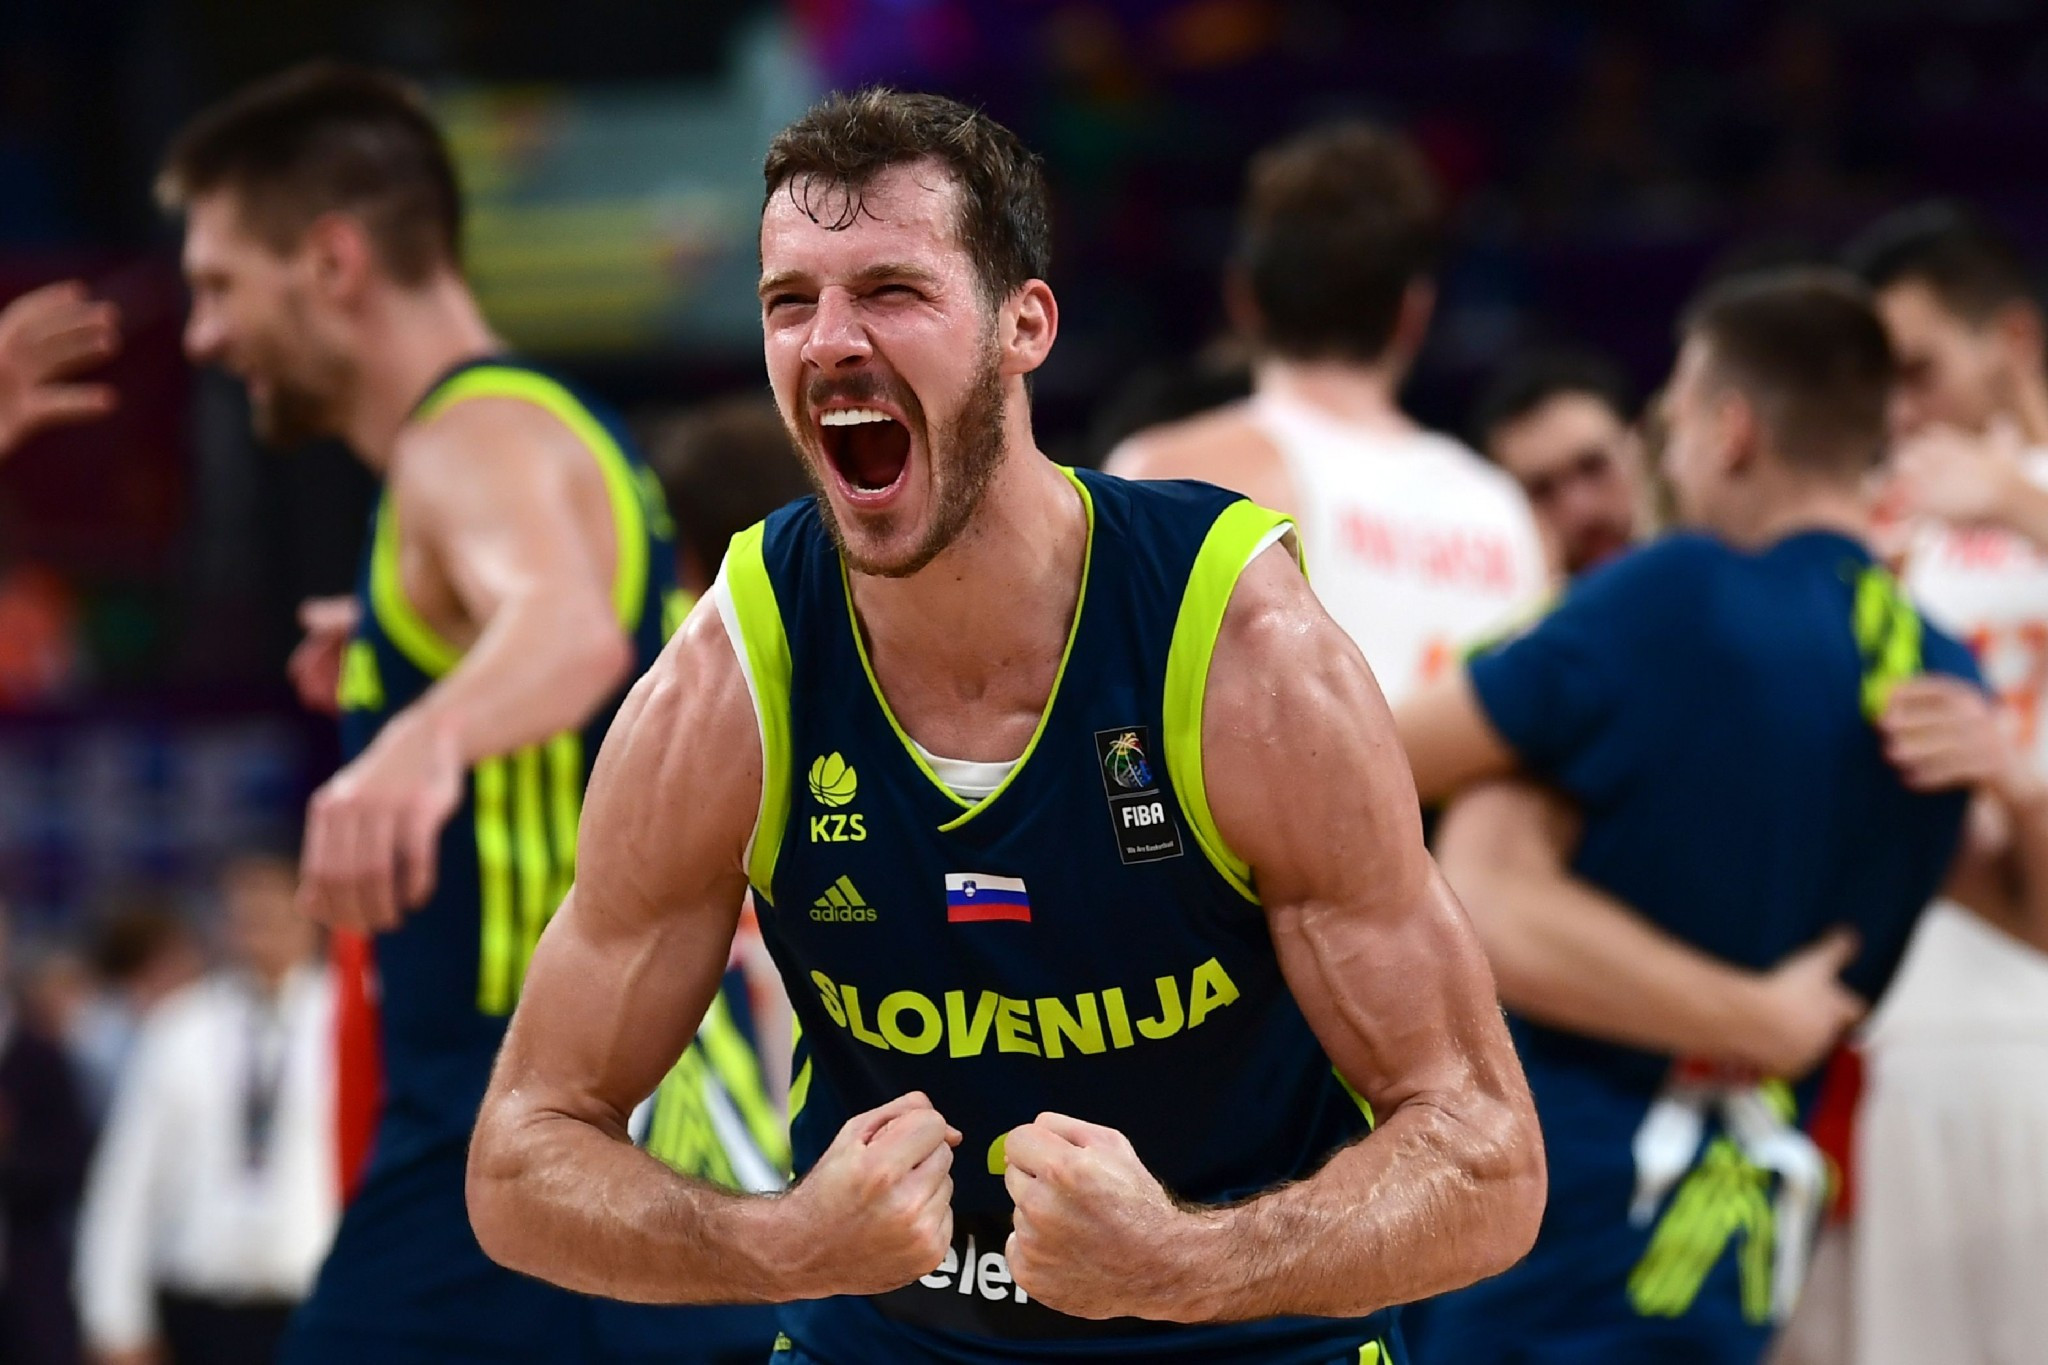 Slovenia shock holders Spain to reach EuroBasket final